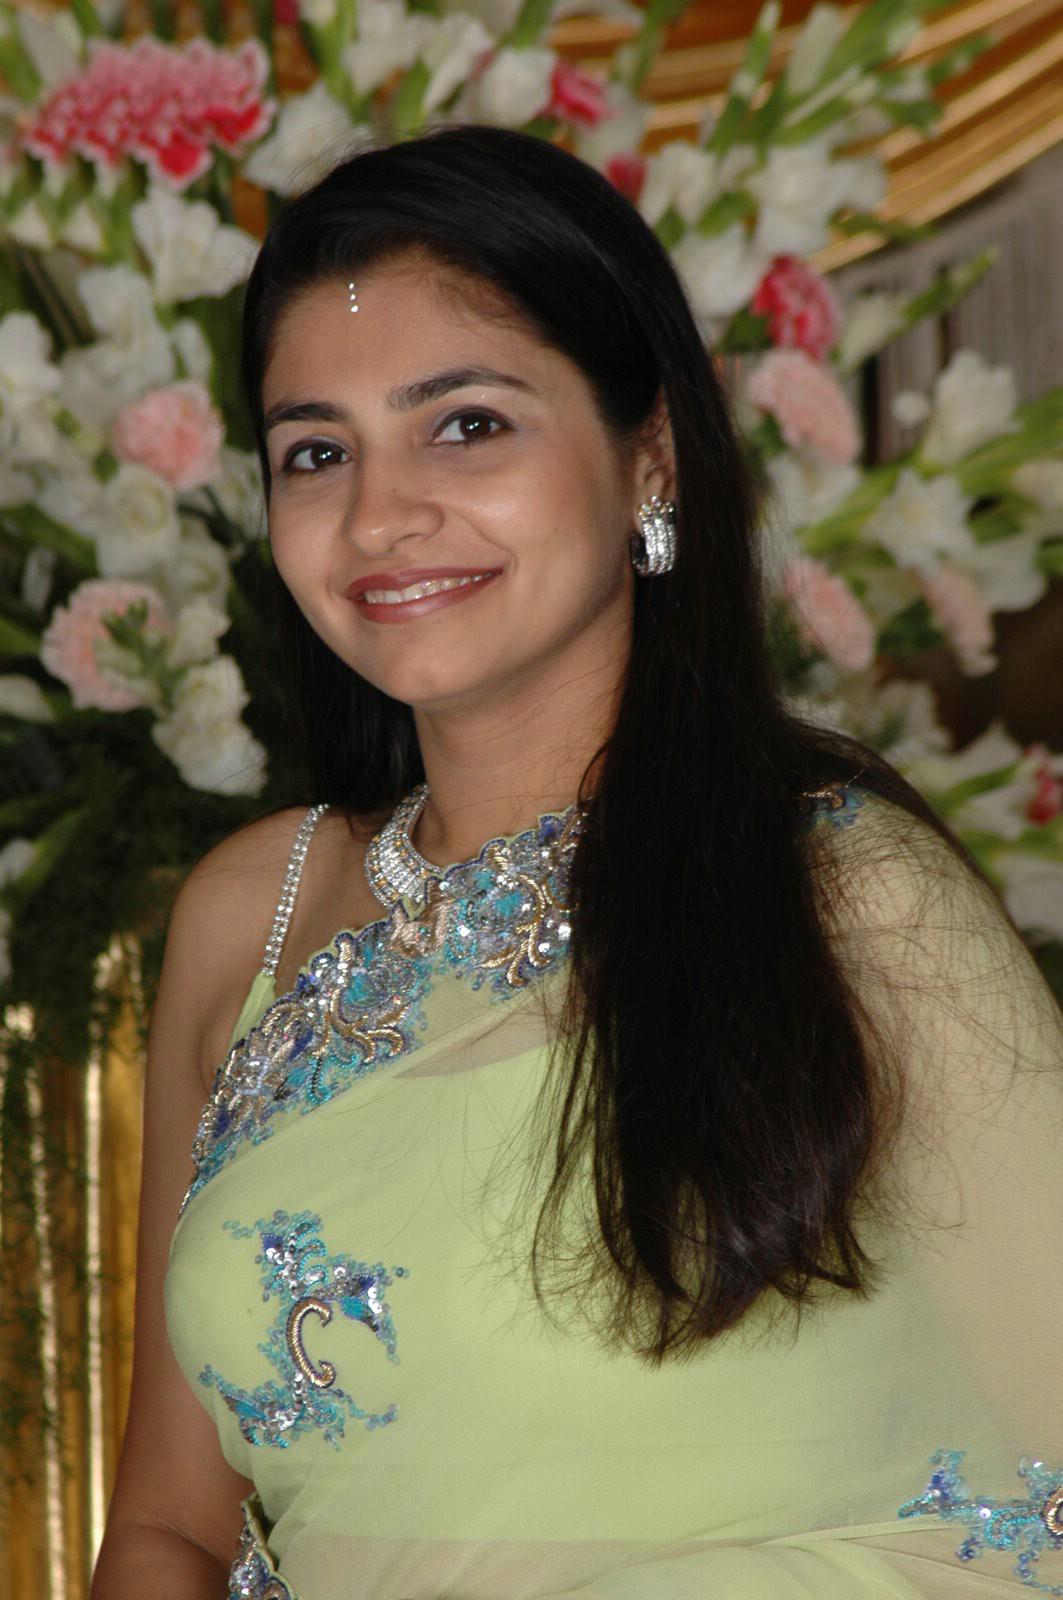 Hd Simple Wallpapers Hot Punjabi Girls-7782